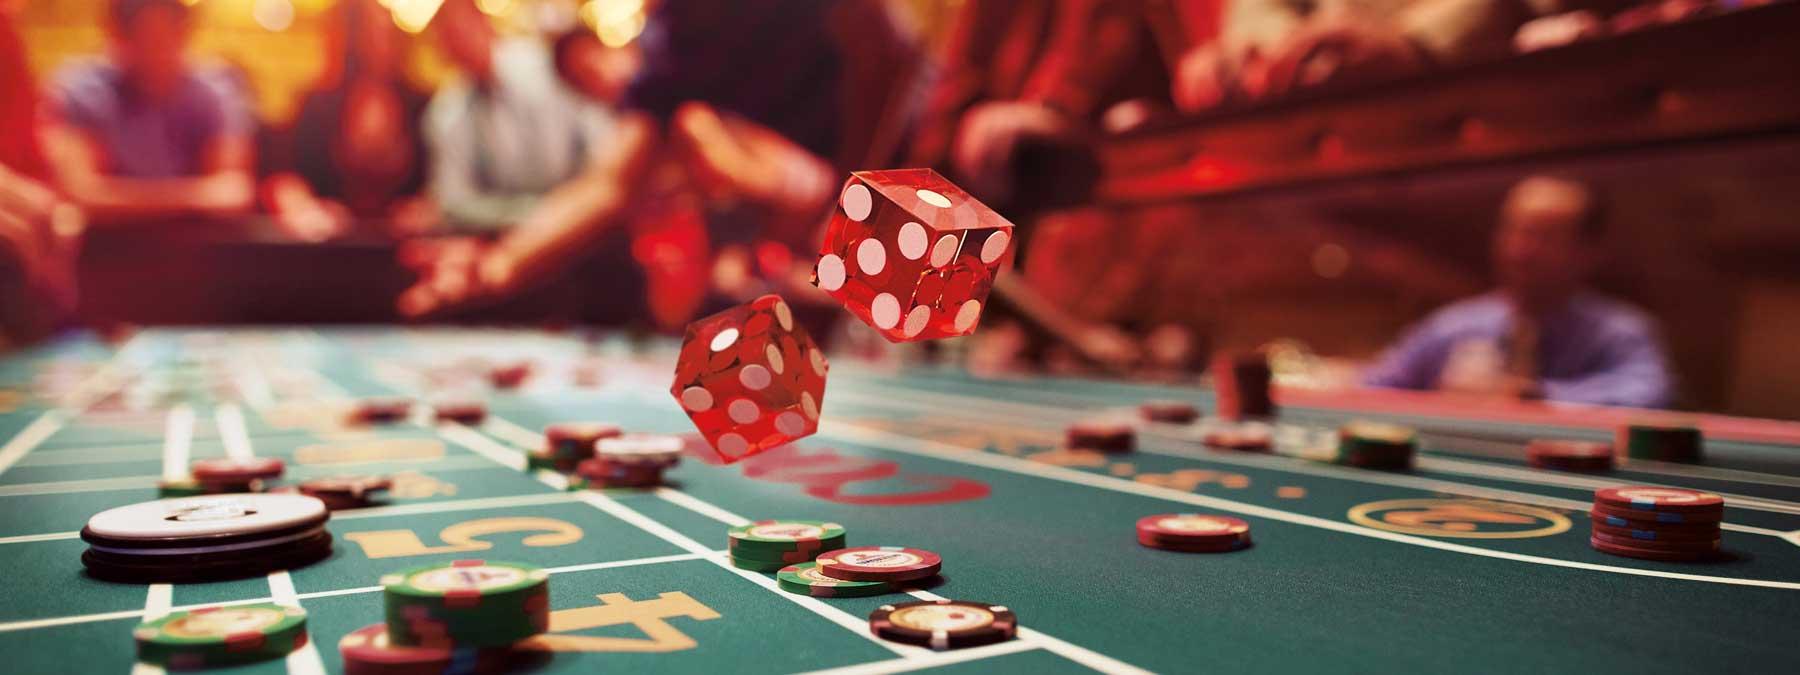 Green casino table